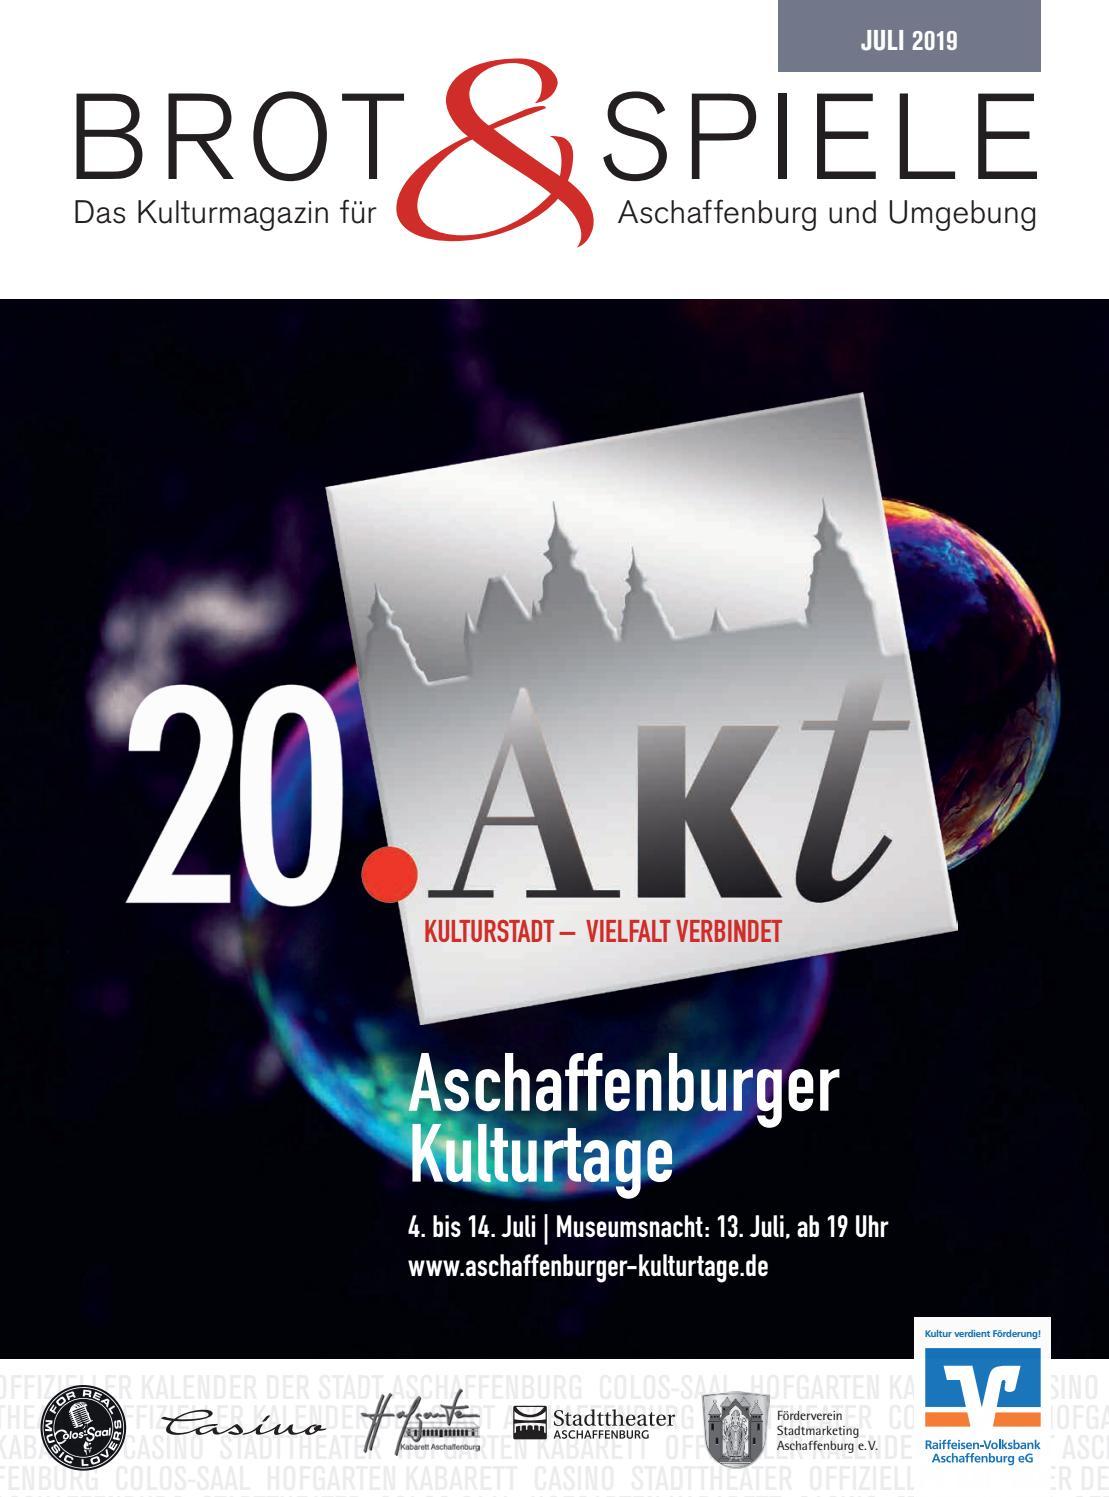 Brot Spiele 07 2019 By Morgenwelt Verlag Issuu